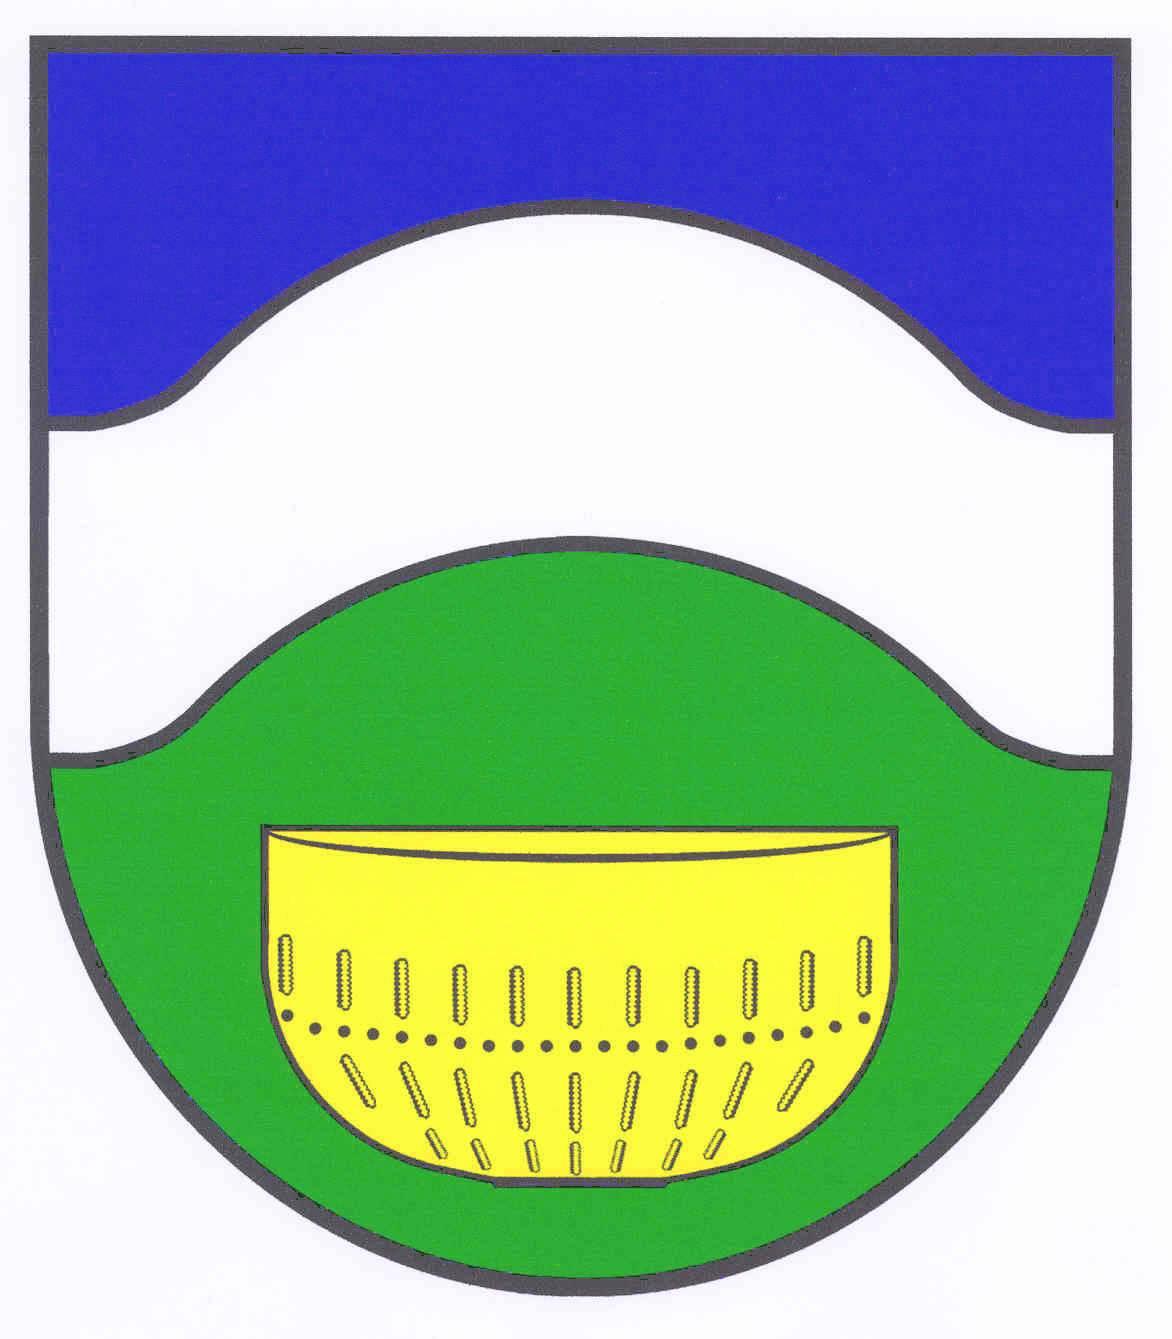 Wappen GemeindeGönnebek, Kreis Segeberg